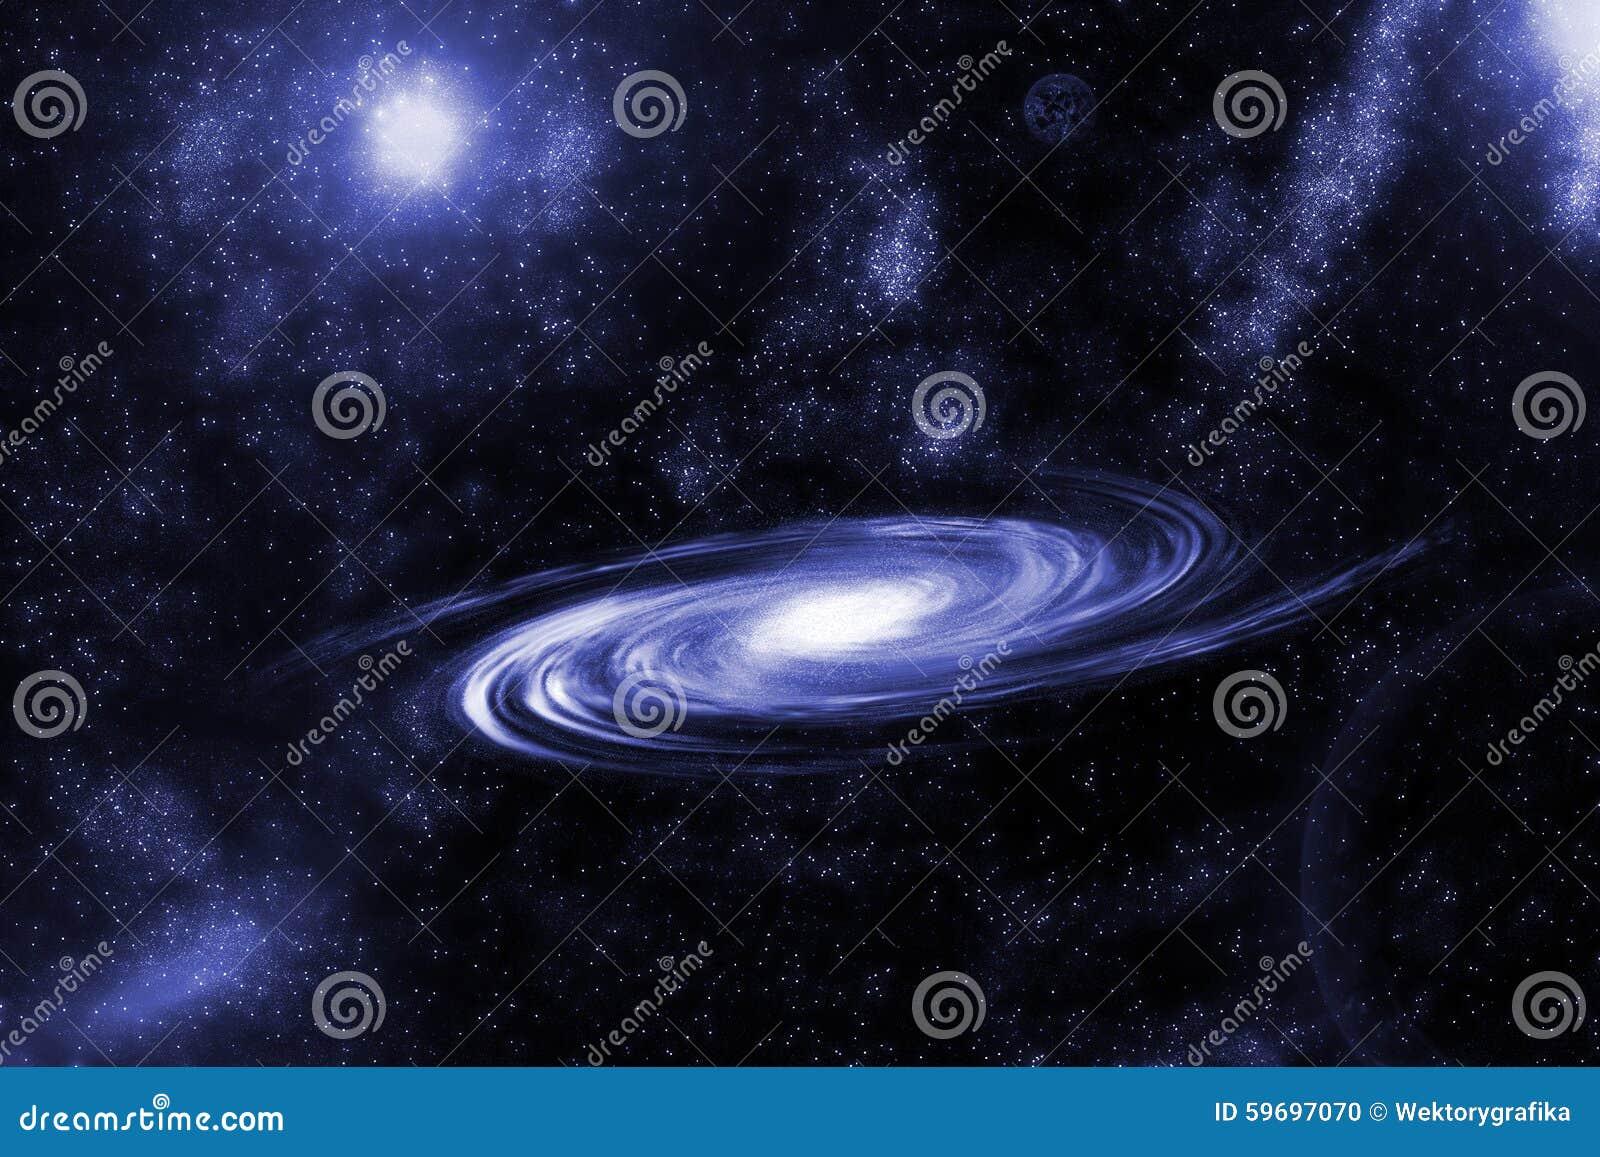 backgrounds desktop field star - photo #35